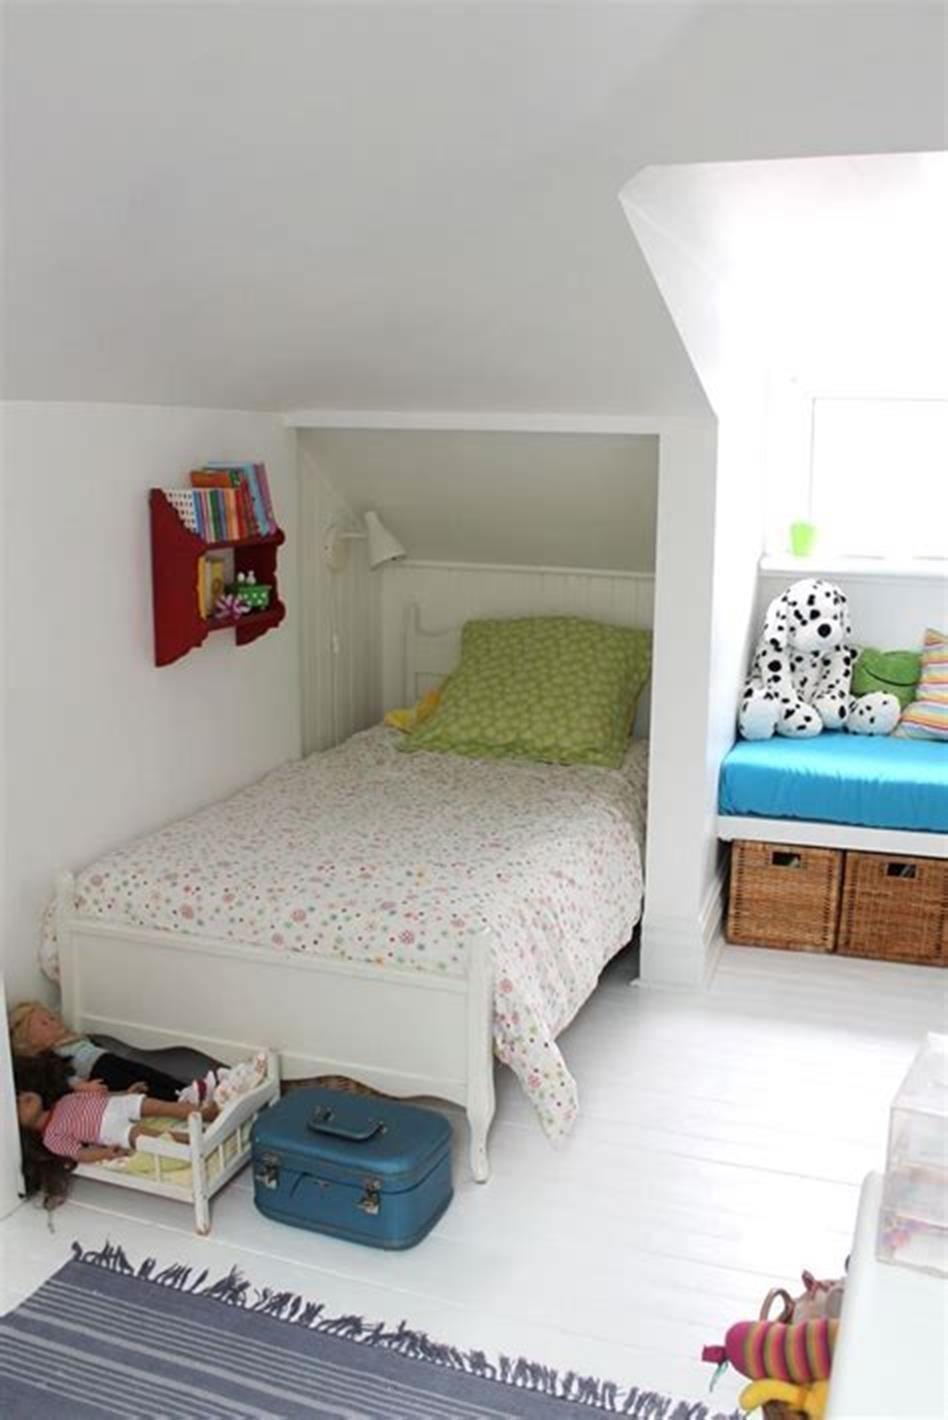 37 Adorable Attic Bedroom Ideas For Girls You Ll Love Craft Home Ideas Attic Bedroom Small Attic Bedroom Designs Loft Room